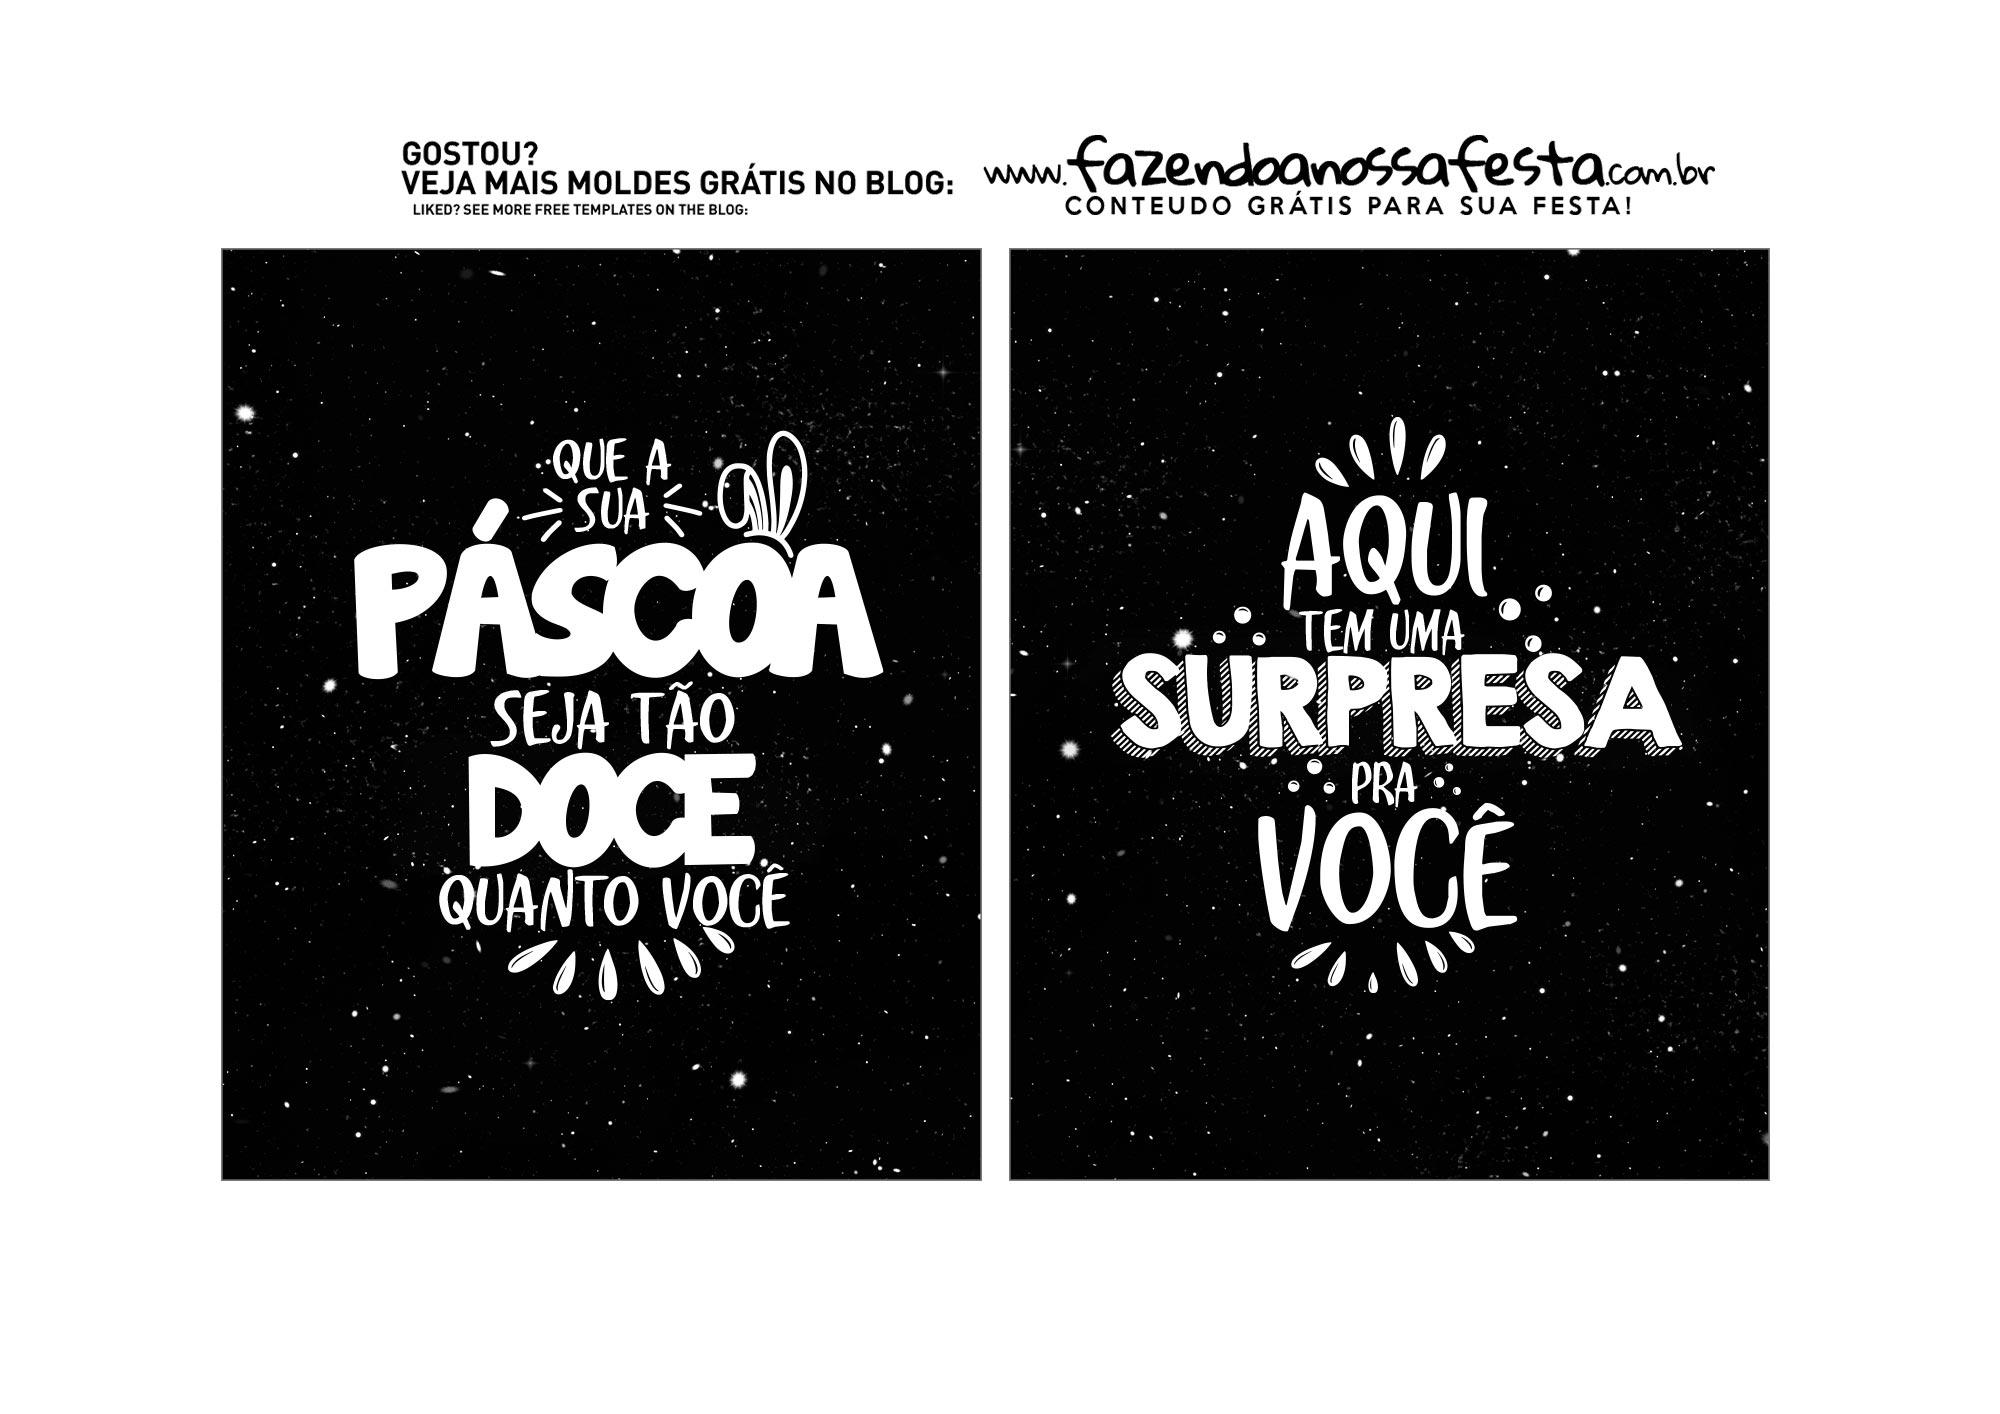 Caixa Explosao Mini Confeiteiro Among us parte 5